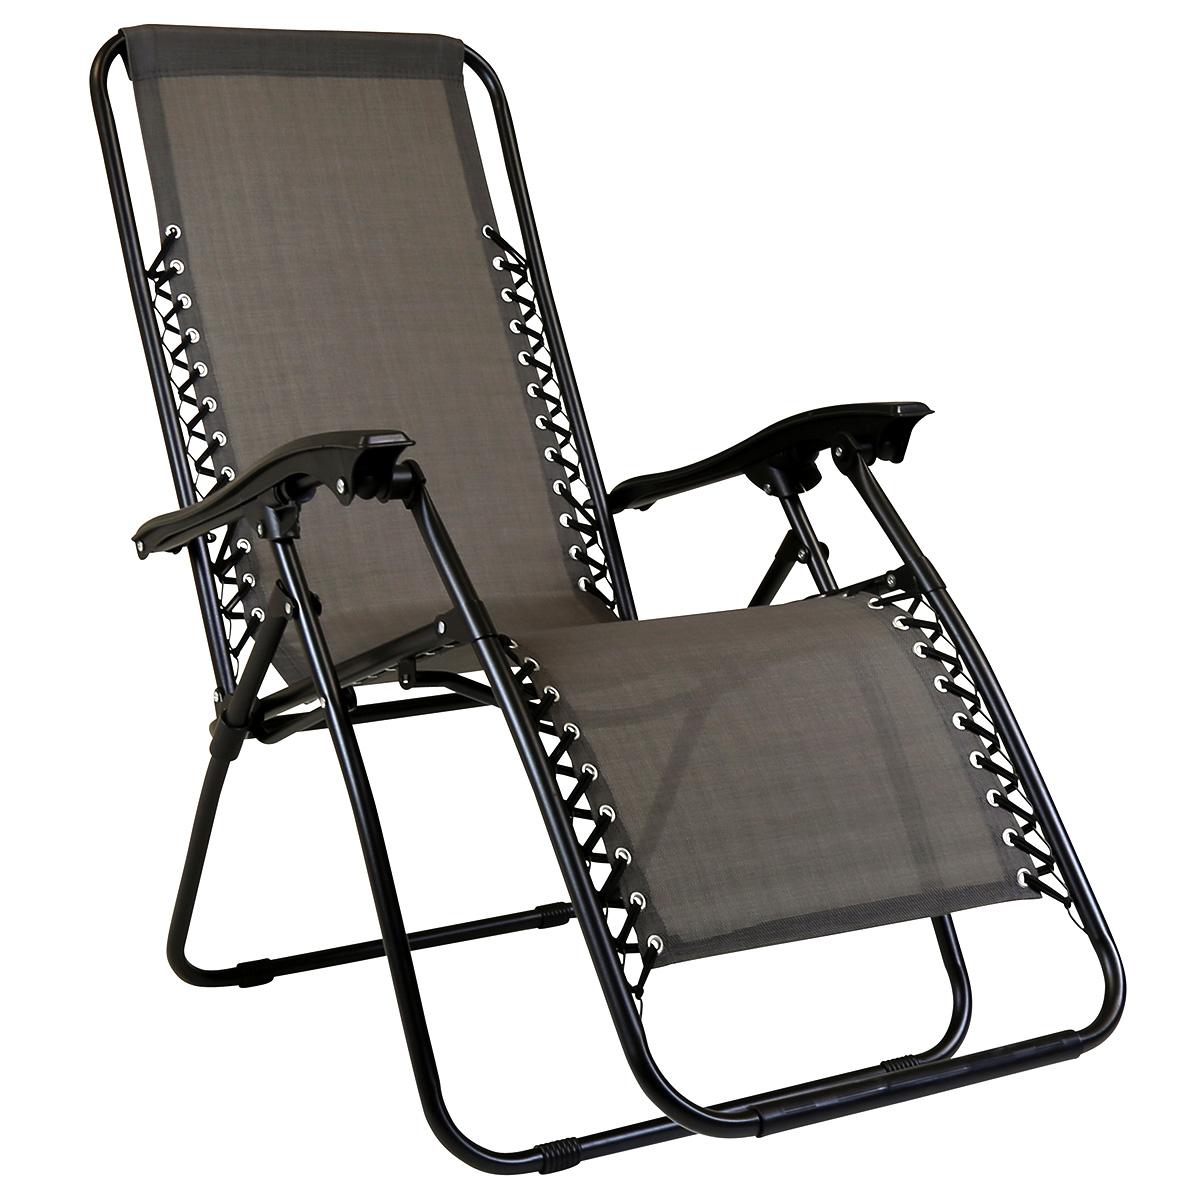 Fabulous Charles Bentley Zero Gravity Folding Reclining Lounger Grey Creativecarmelina Interior Chair Design Creativecarmelinacom